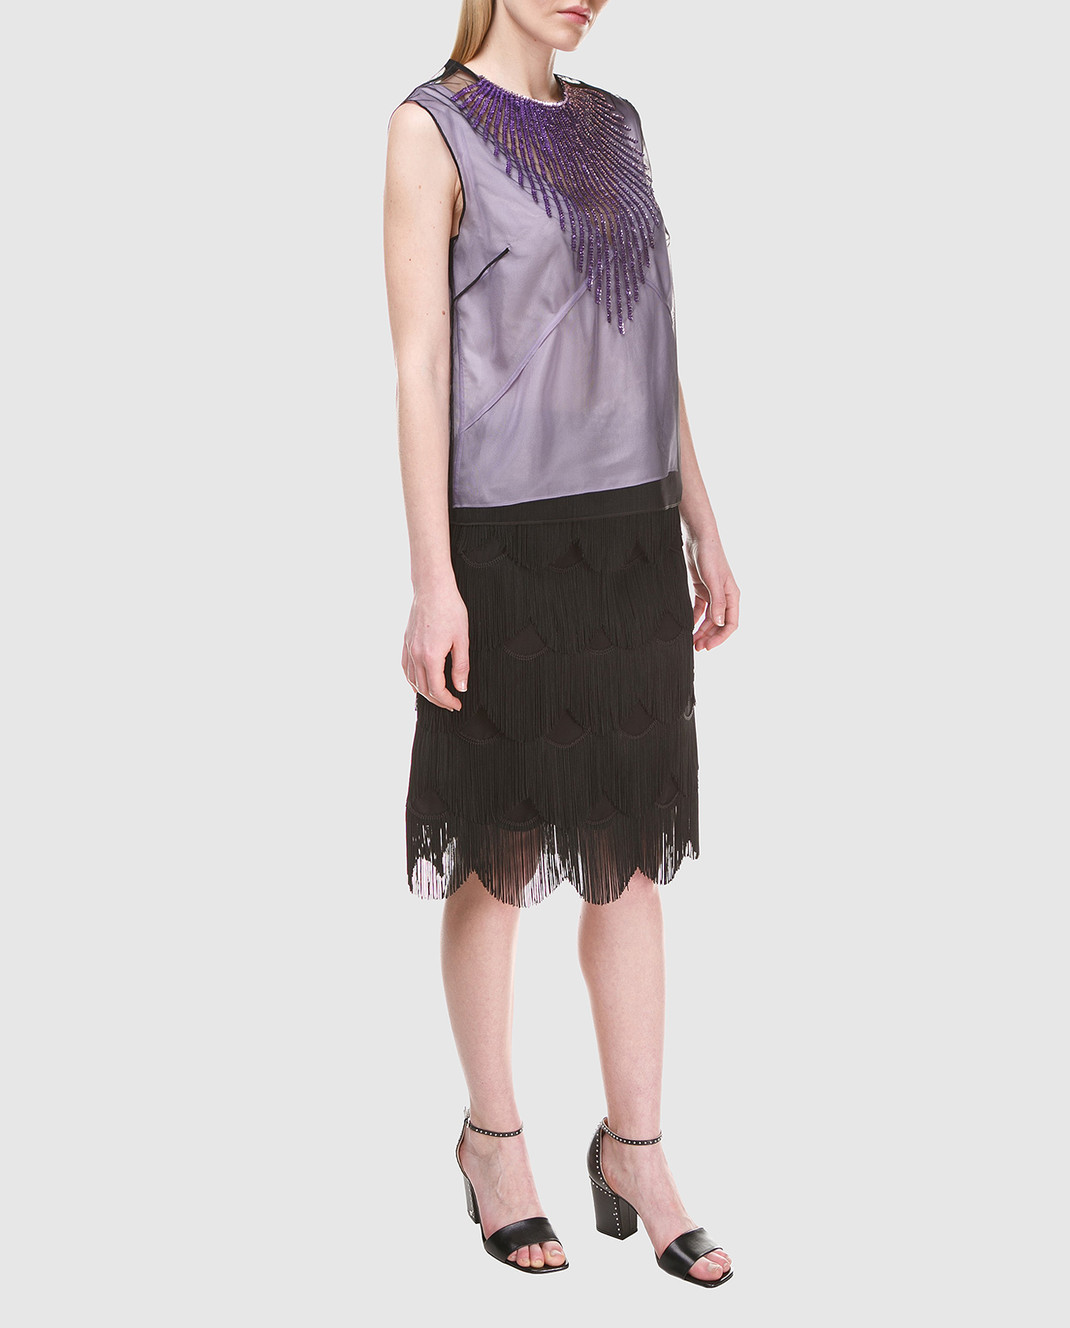 Marc Jacobs Черная юбка с бахромой M4007189 изображение 2